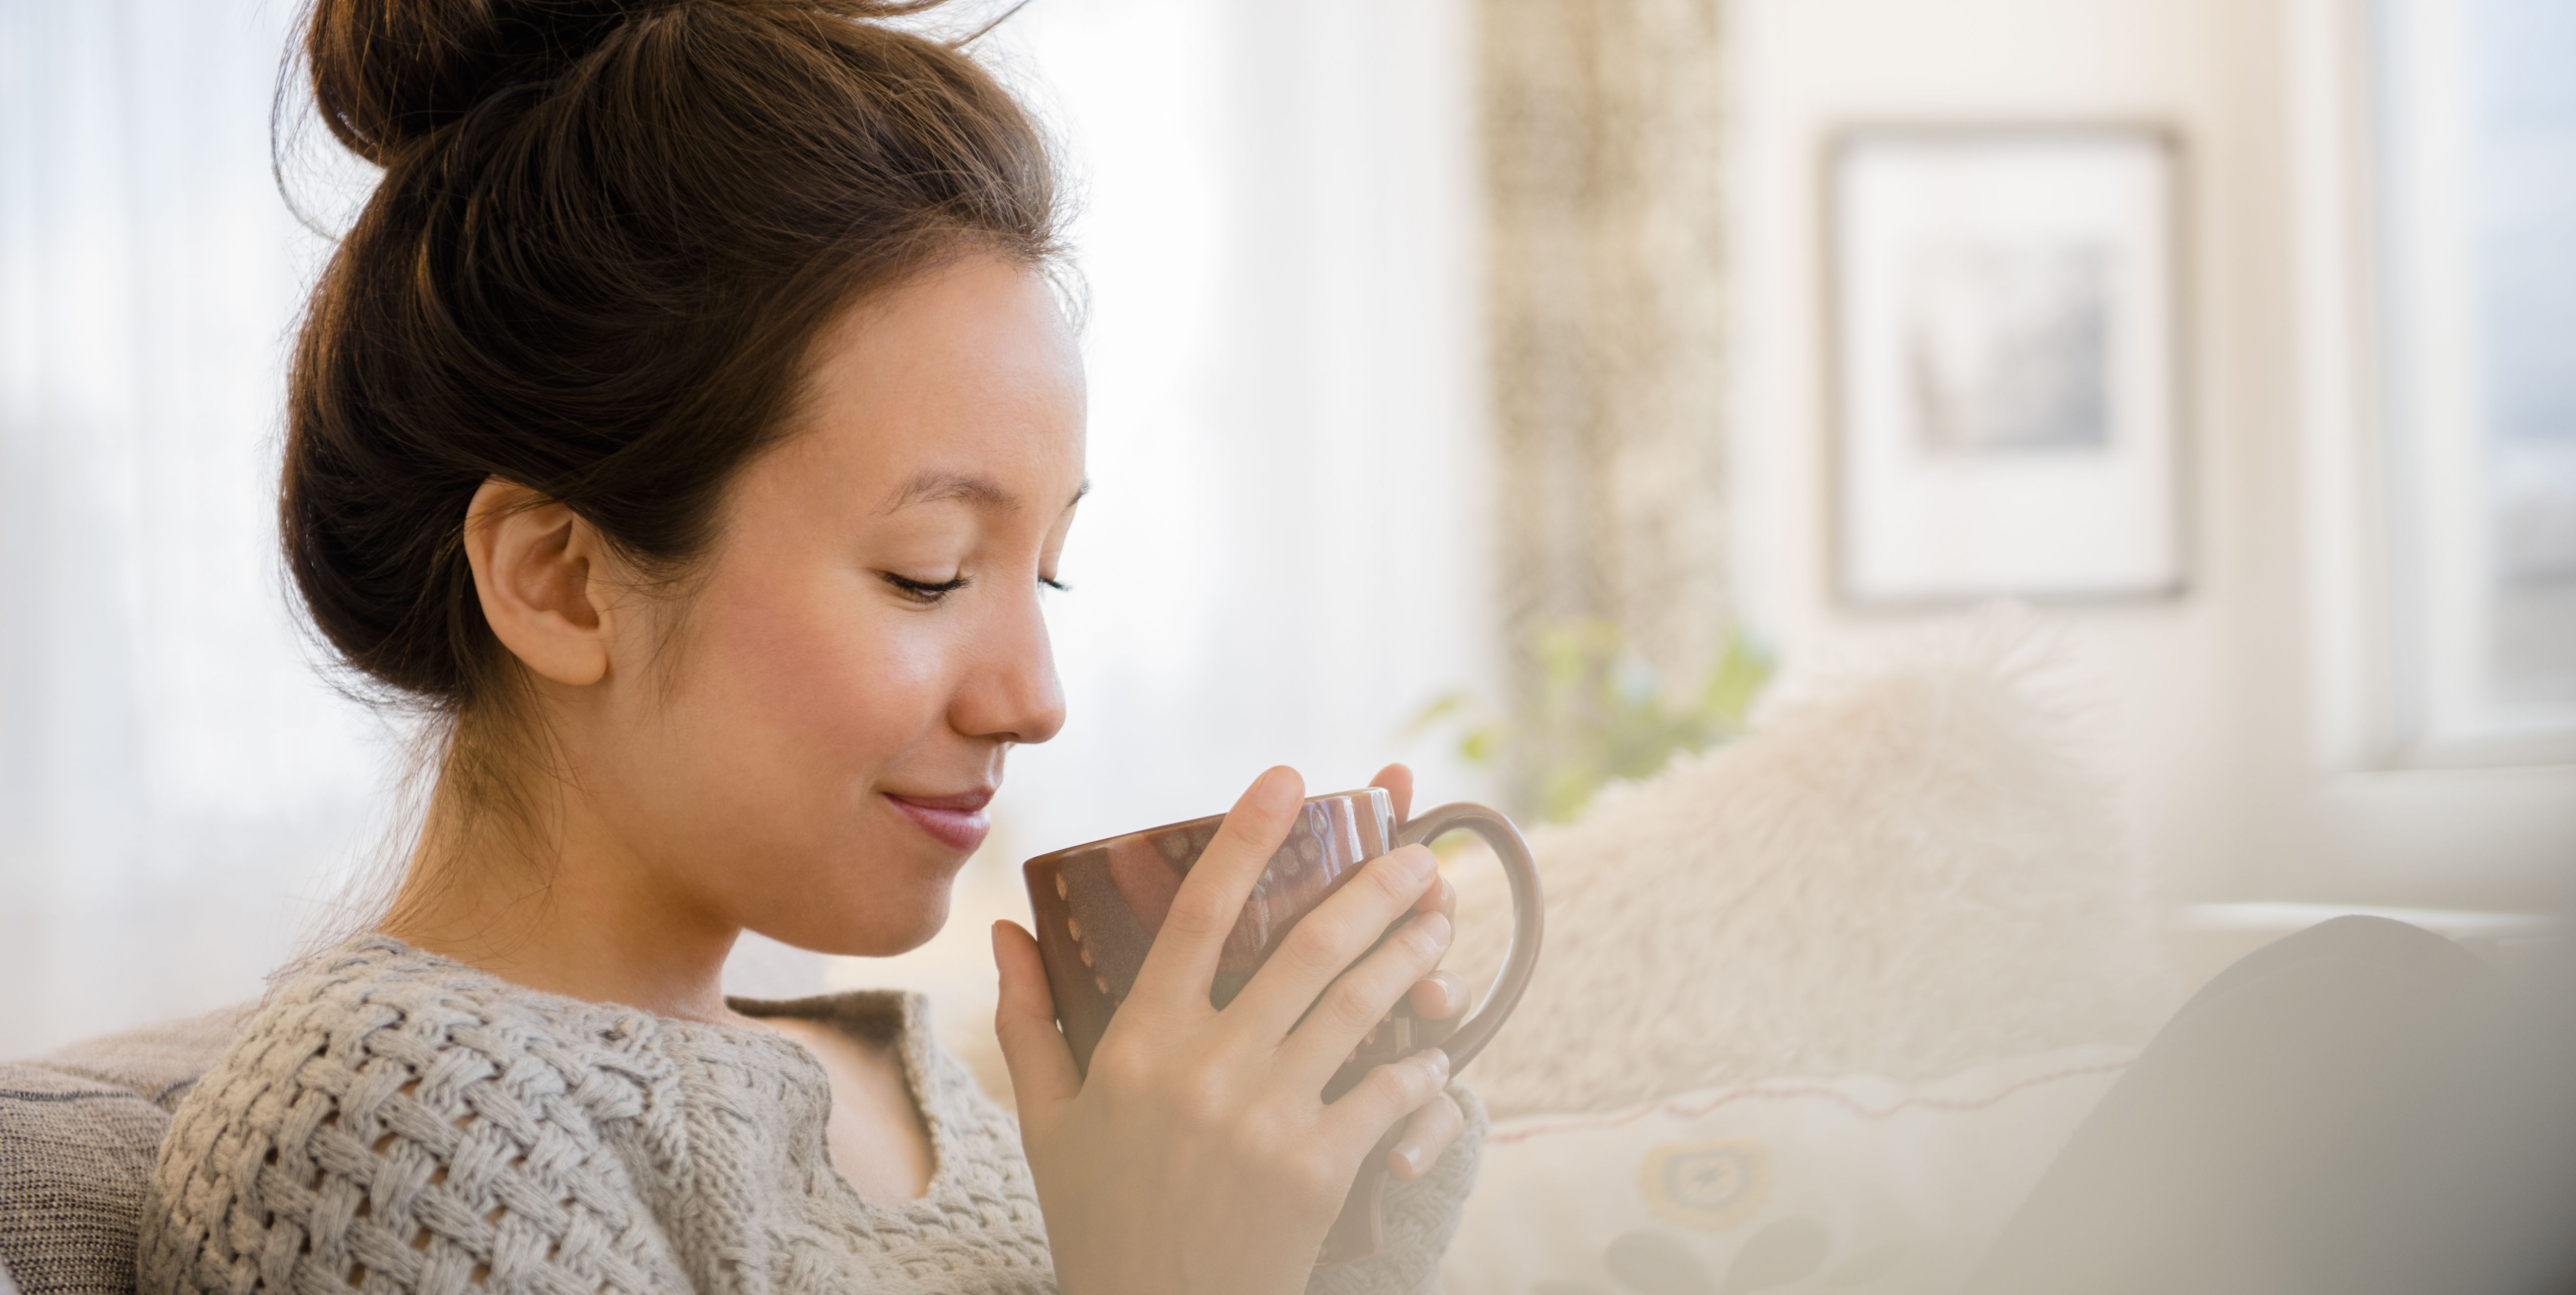 Mixed race woman drinking coffee on sofa